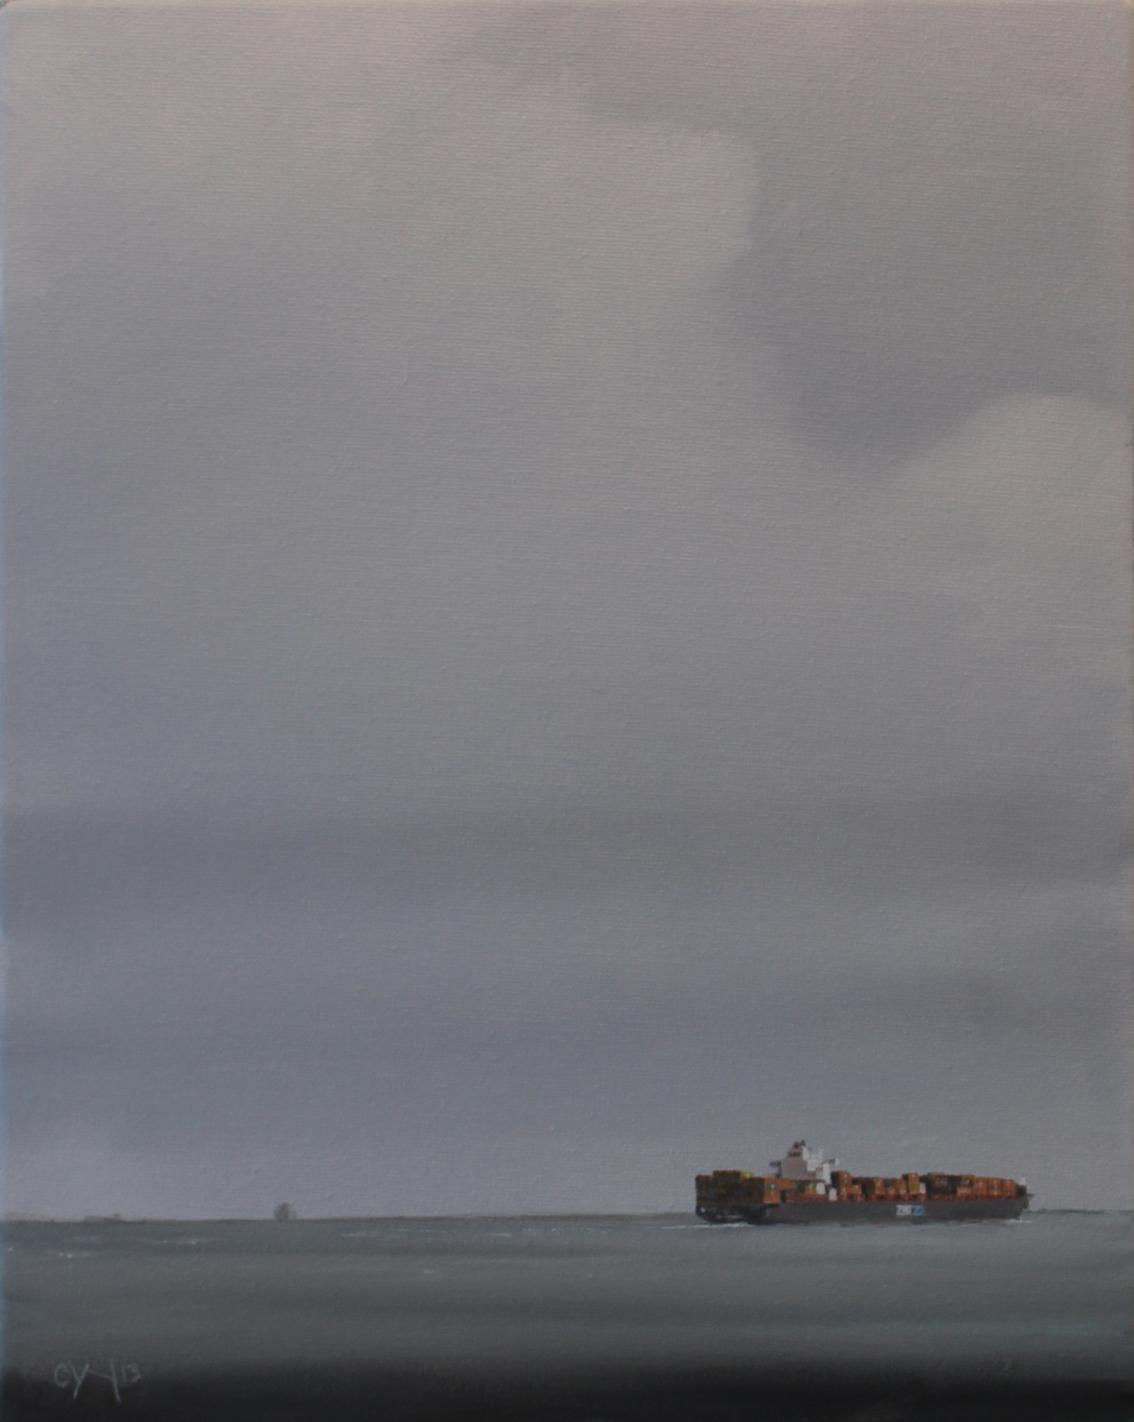 'Zim Mediterranean w/ ACL Atlantic Compass'